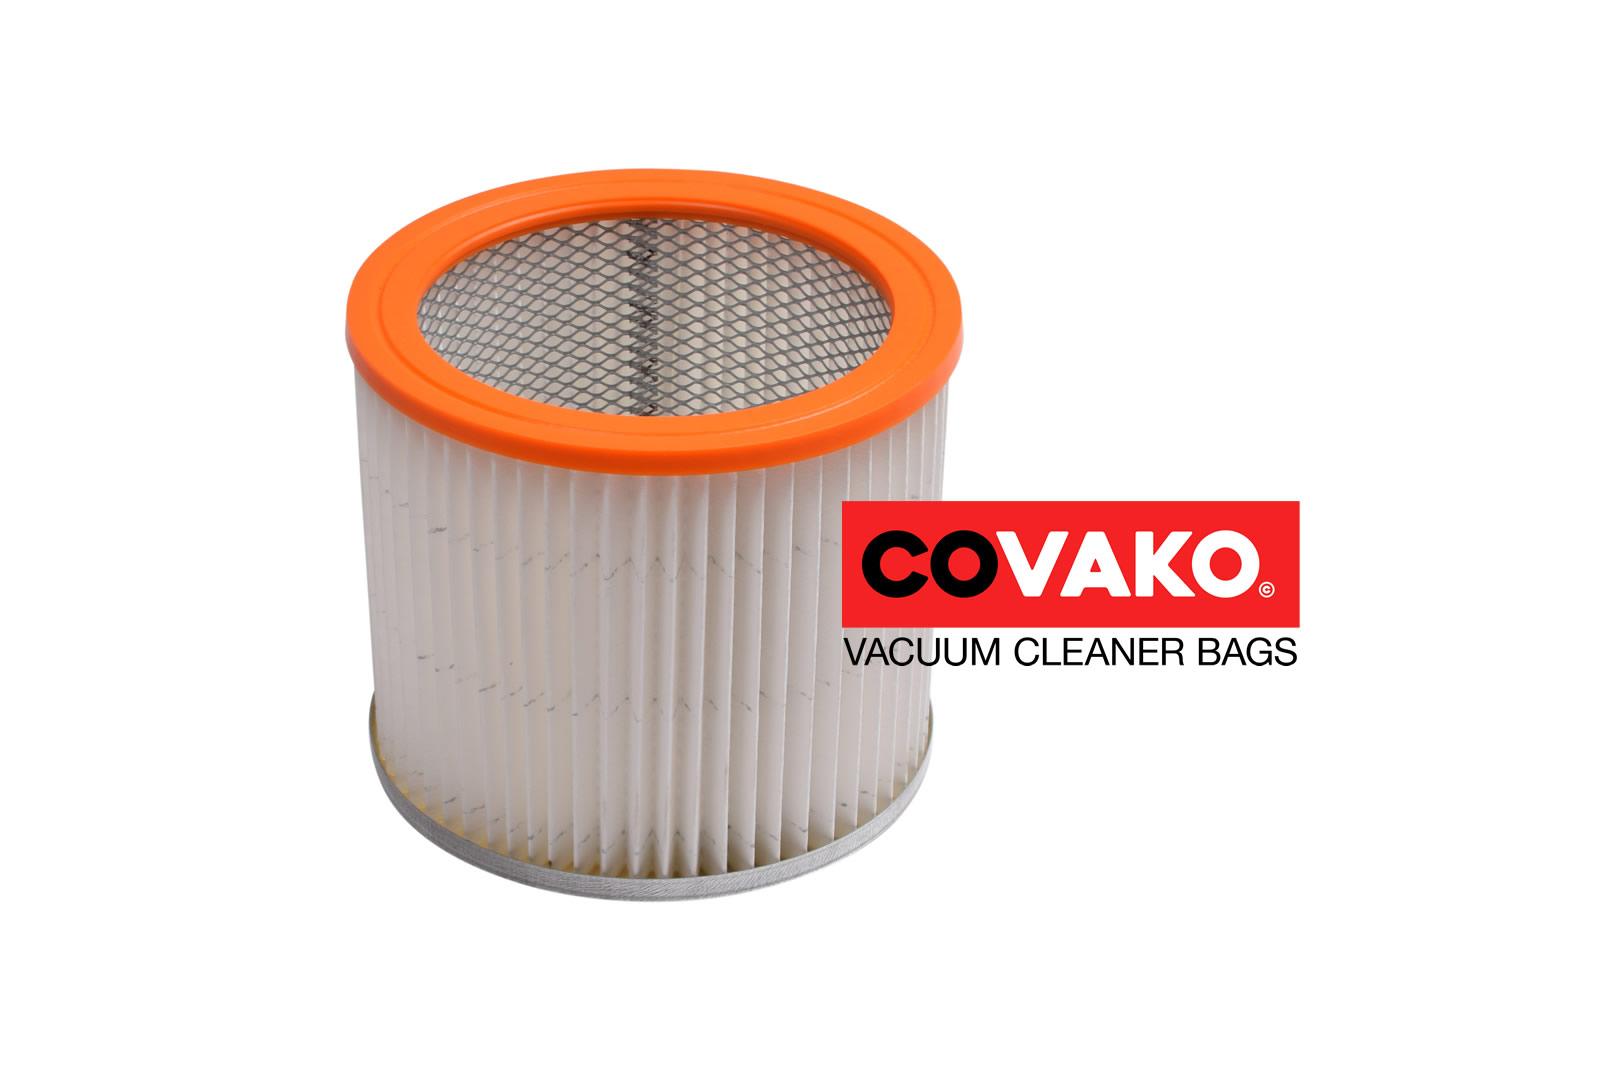 Abluftfilter / Part Item - Abluftfiltervacuum cleaner bags